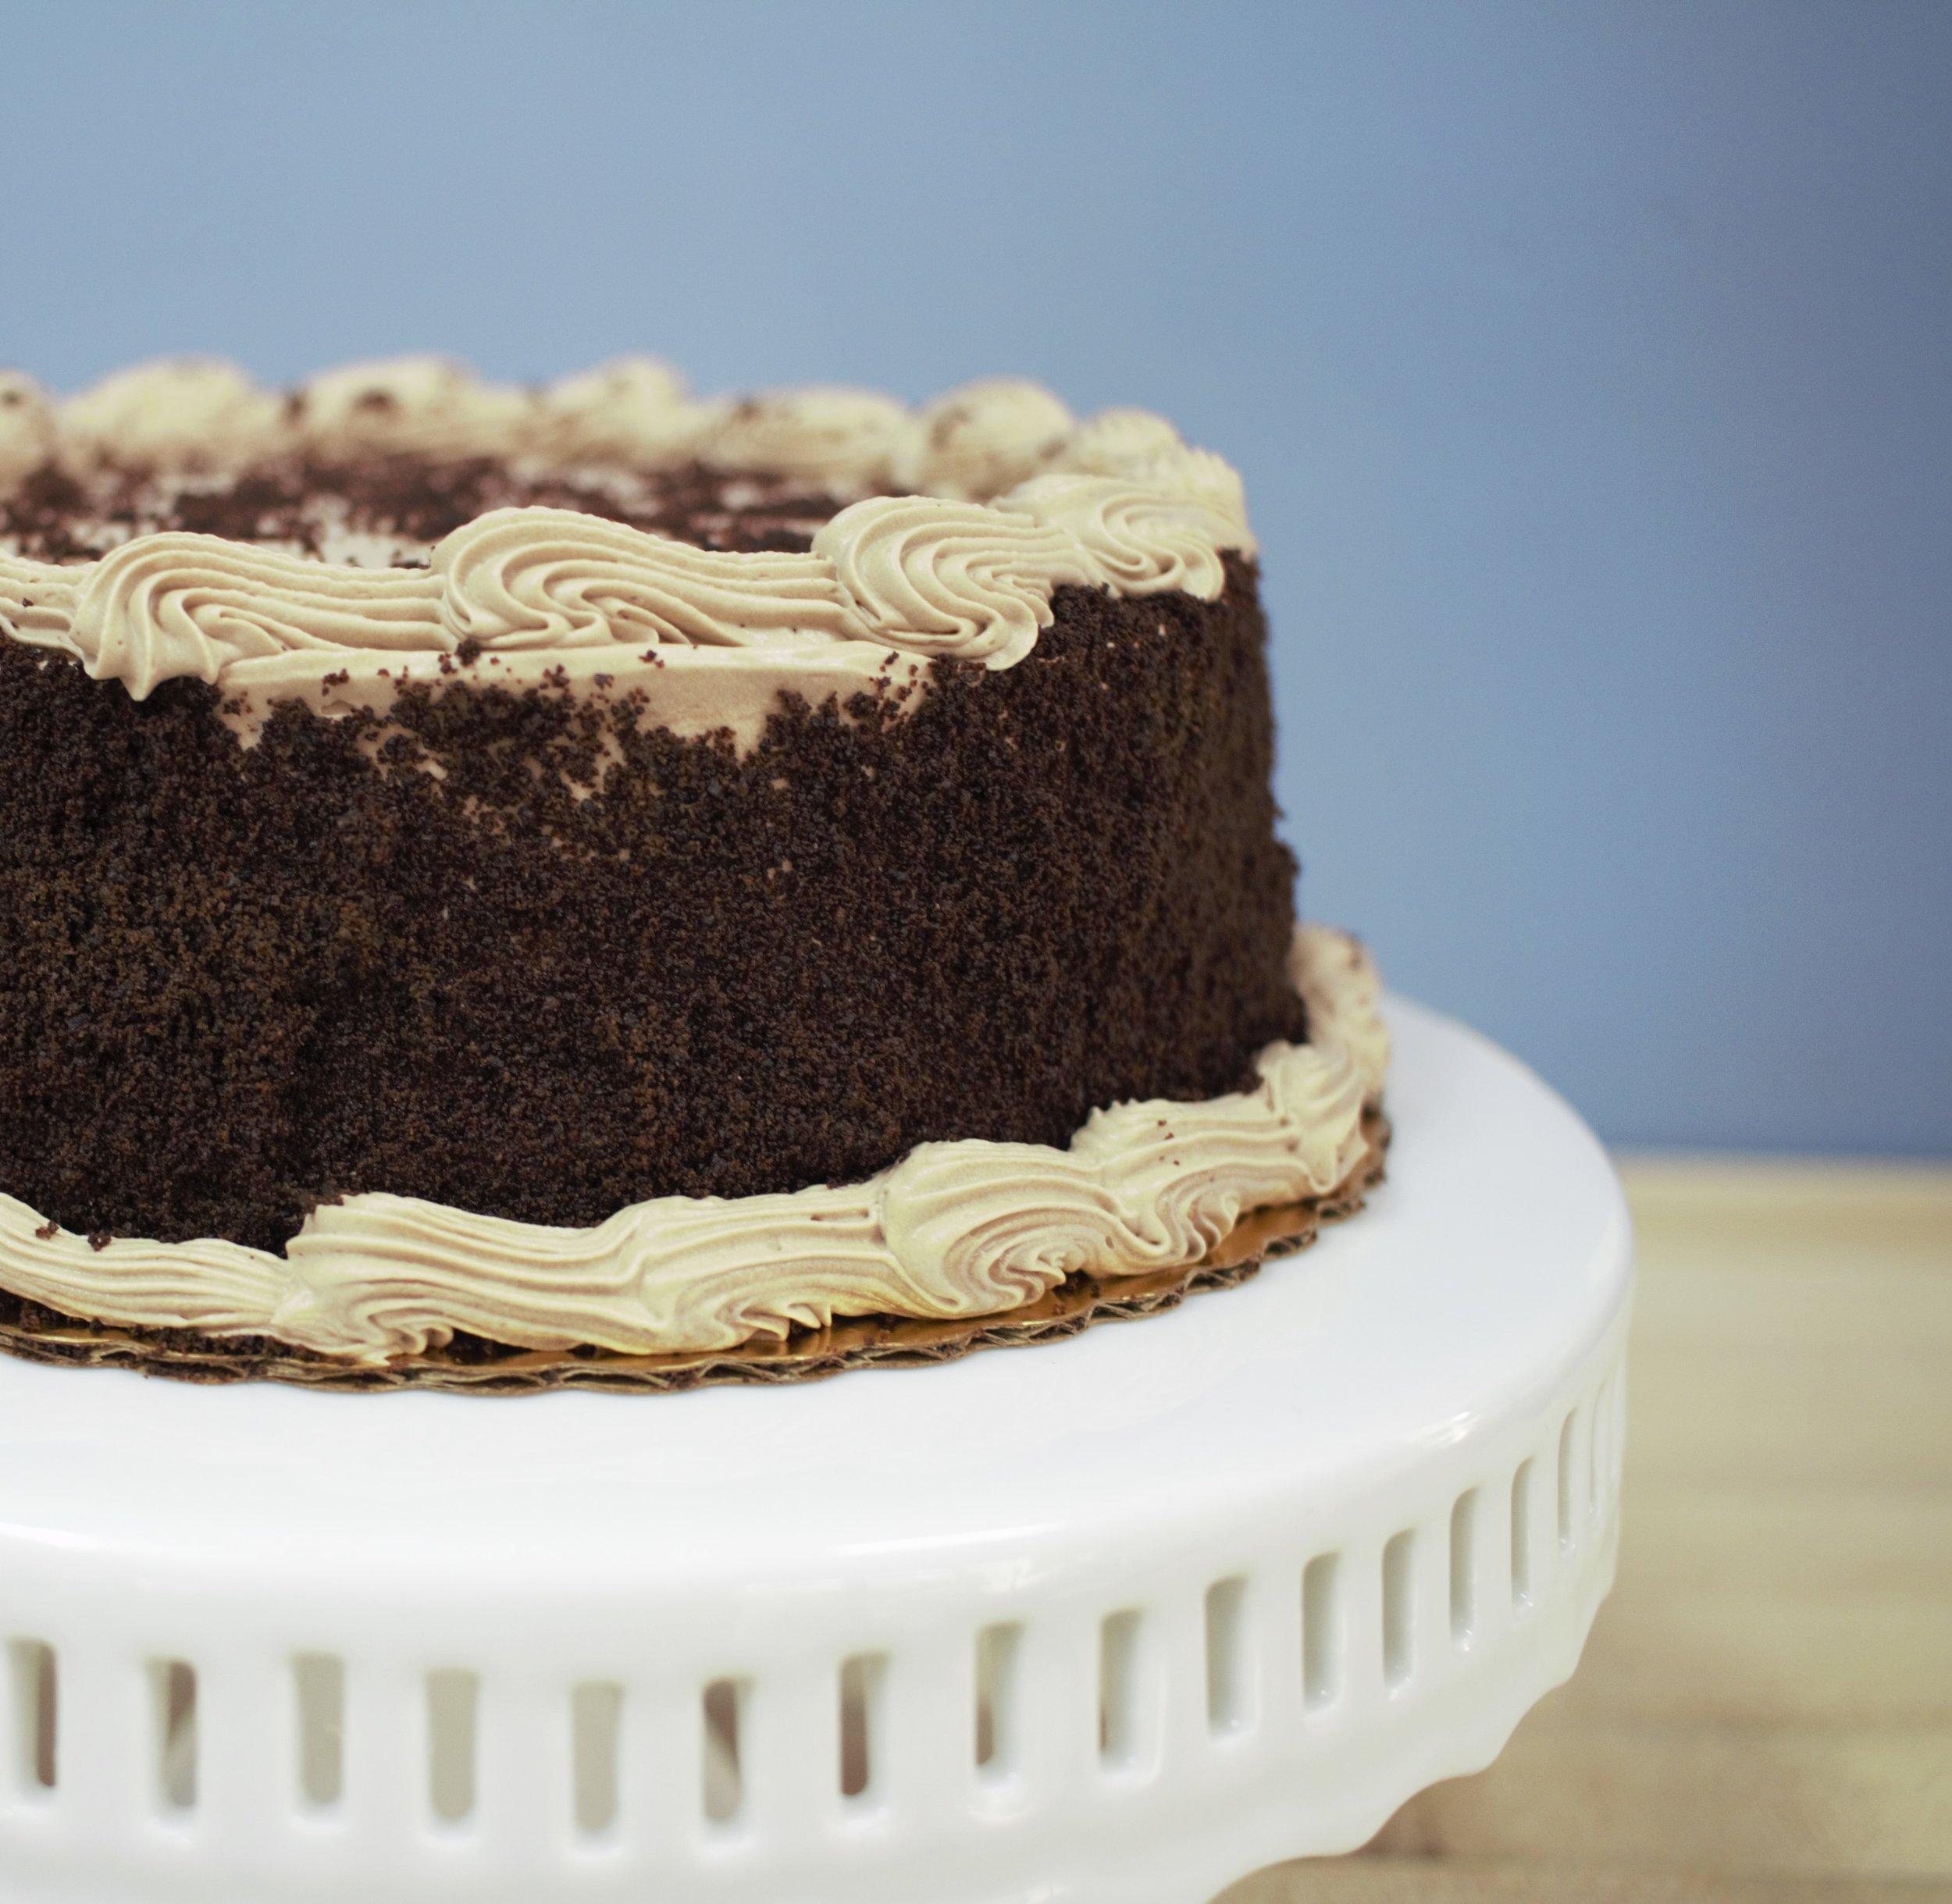 Chocolate Mousse Cake.jpg